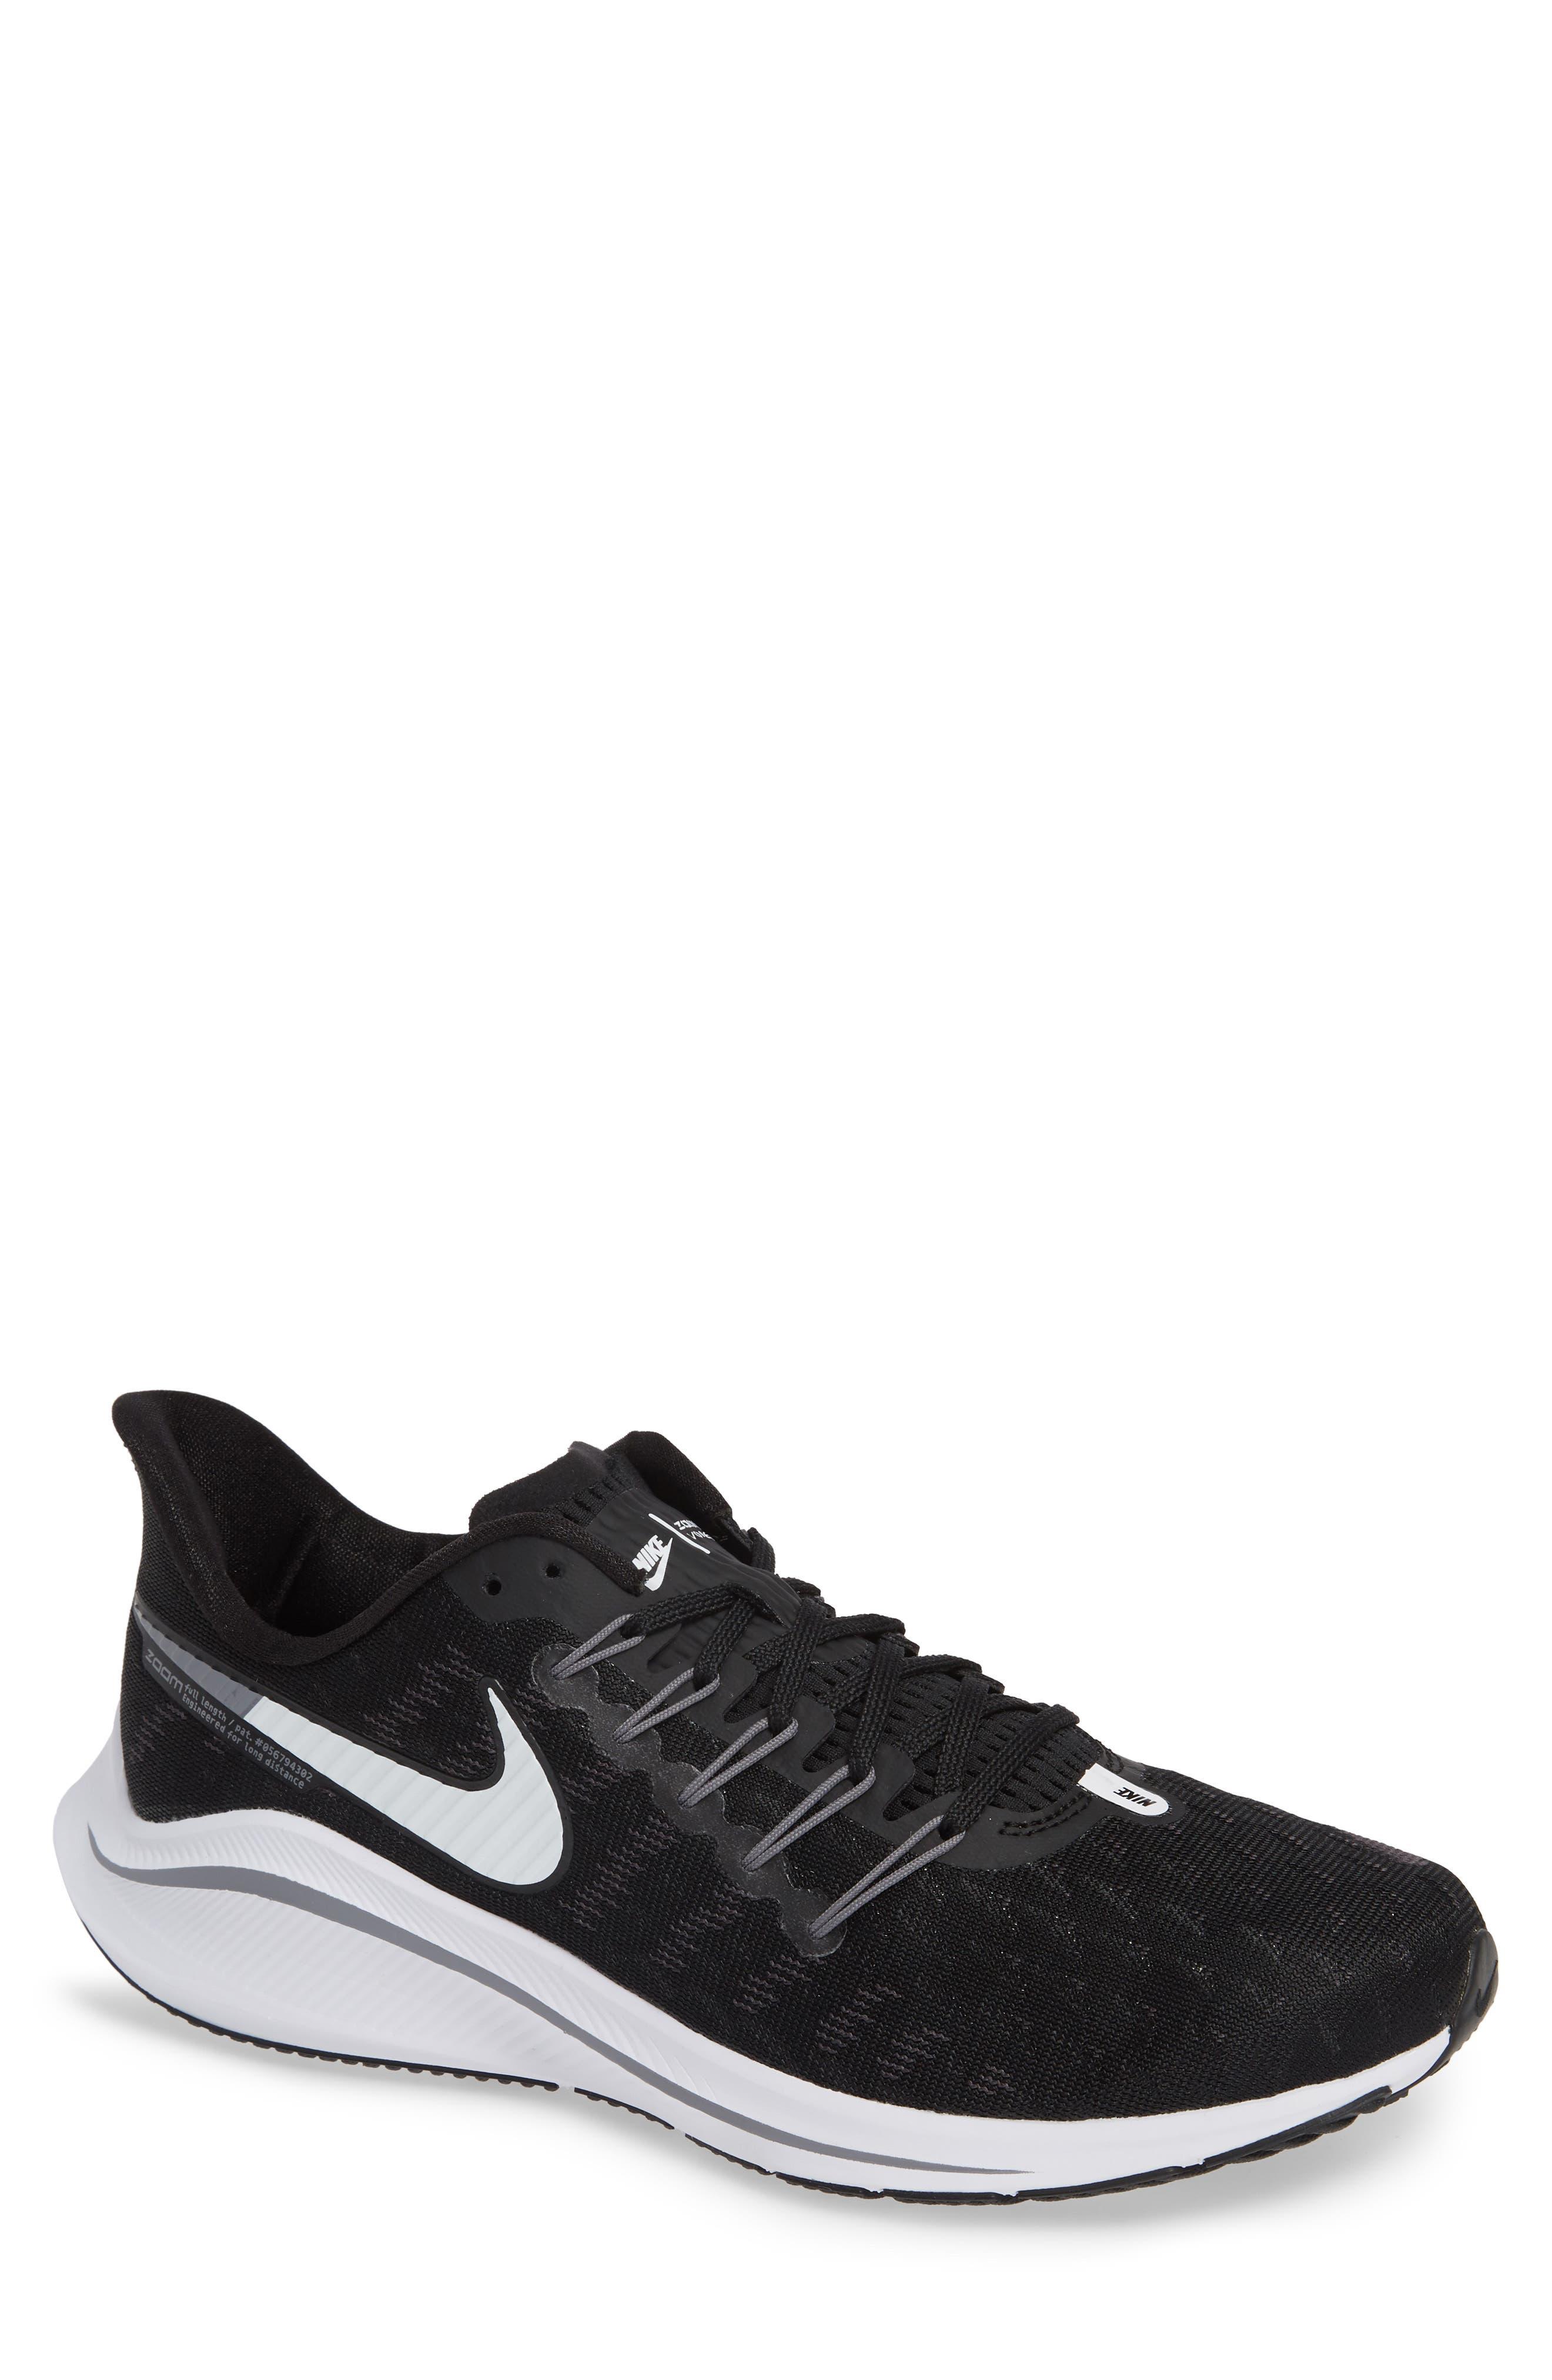 Air Zoom Vomero 14 Running Shoe, Main, color, BLACK/ WHITE/ THUNDER GREY